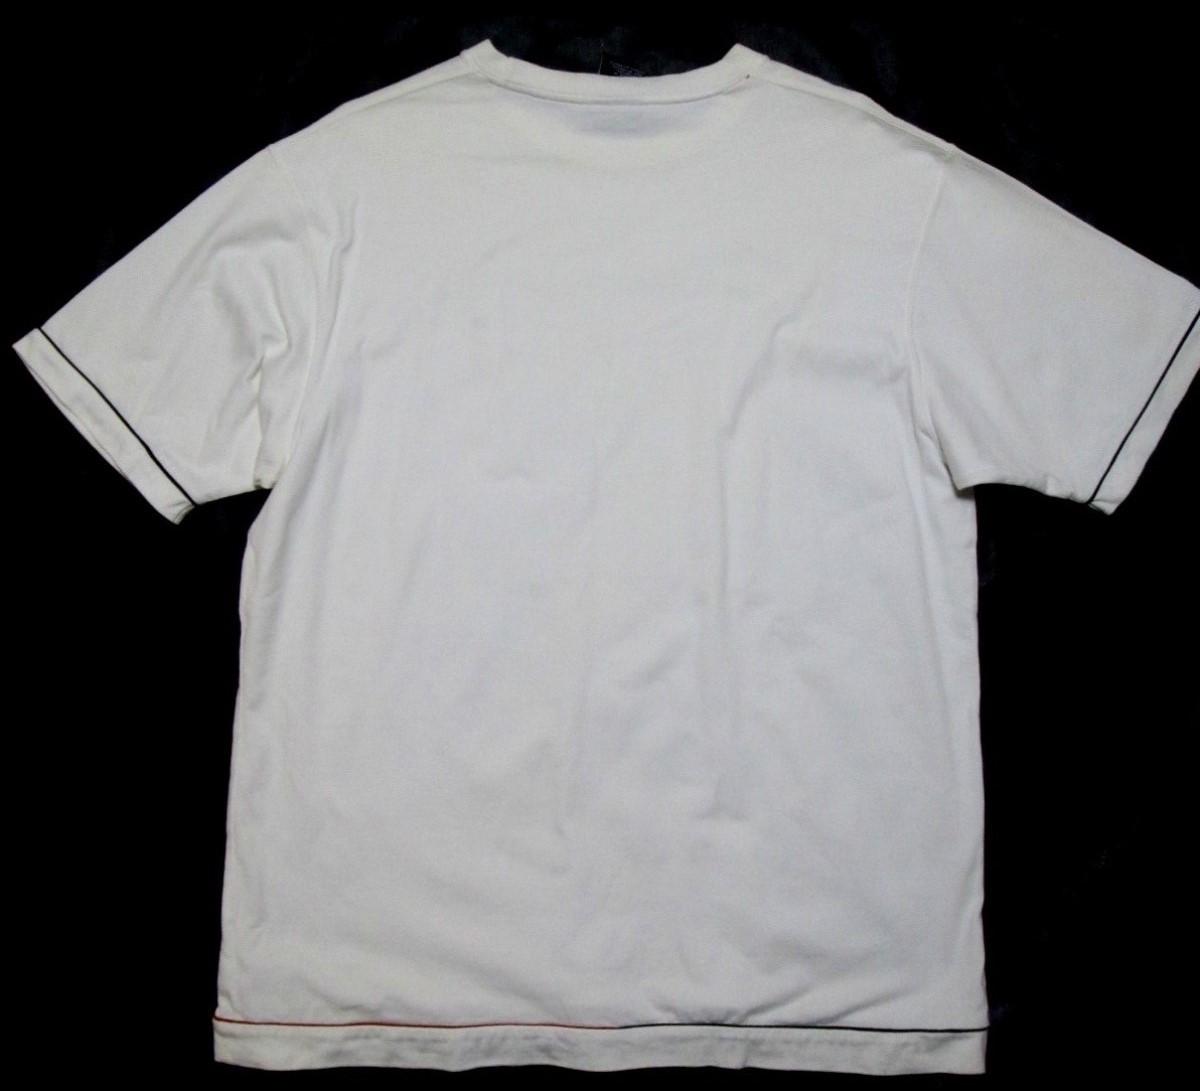 a7a431ad375d 代購代標第一品牌 - 樂淘letao - TOMMY HILFIGER トミーヒルフィガー スモールロゴ刺繍 Tシャツ